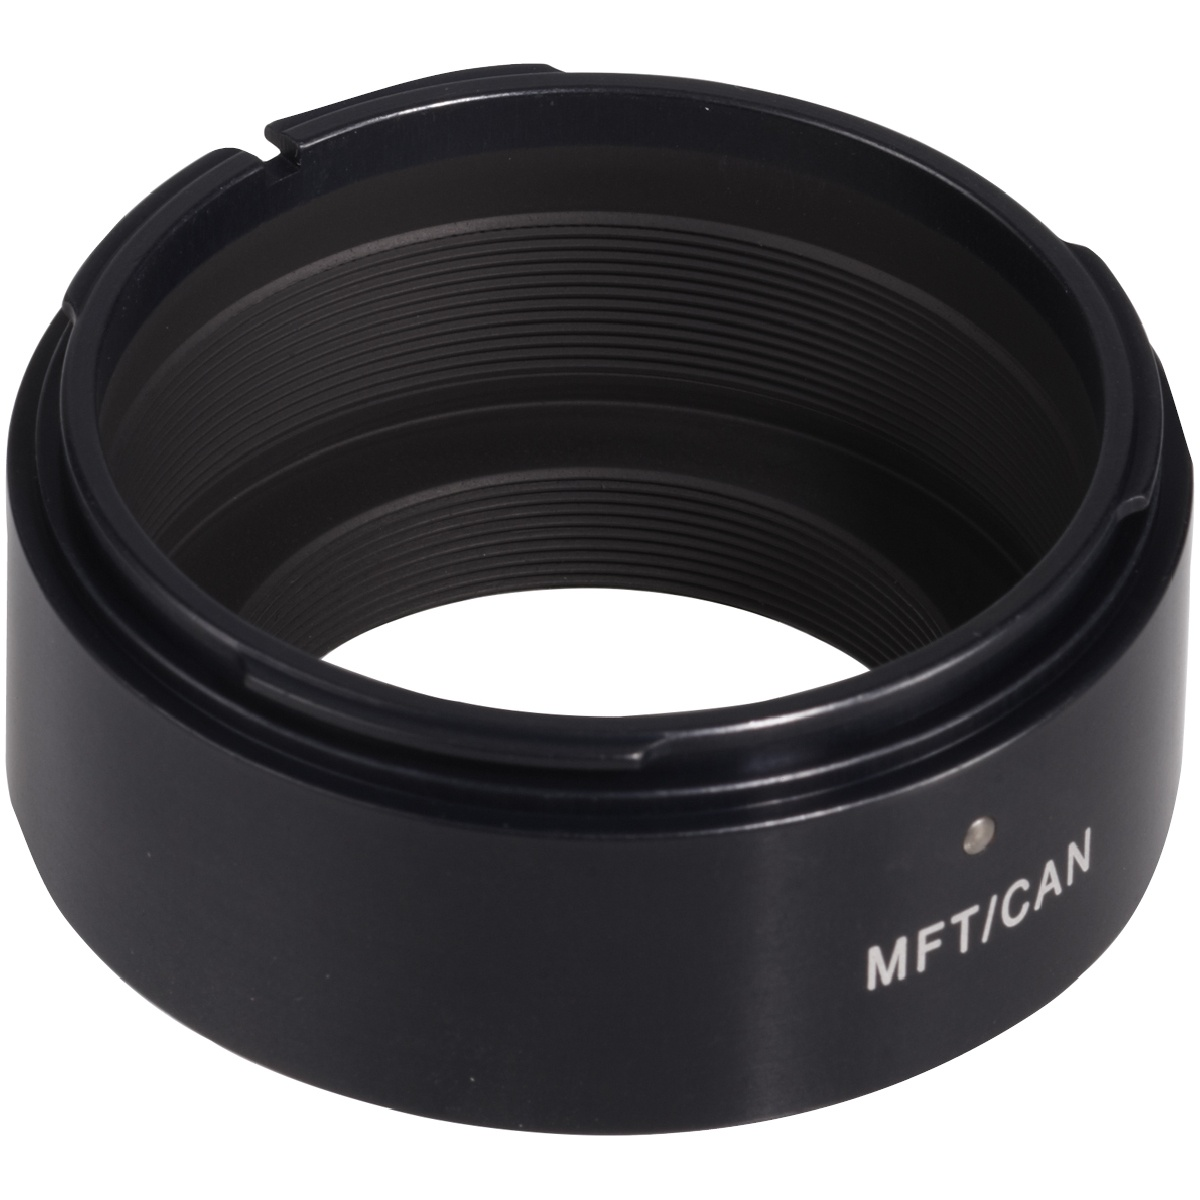 Novoflex Adapter Canon EF Objektive an MFT-Kameras